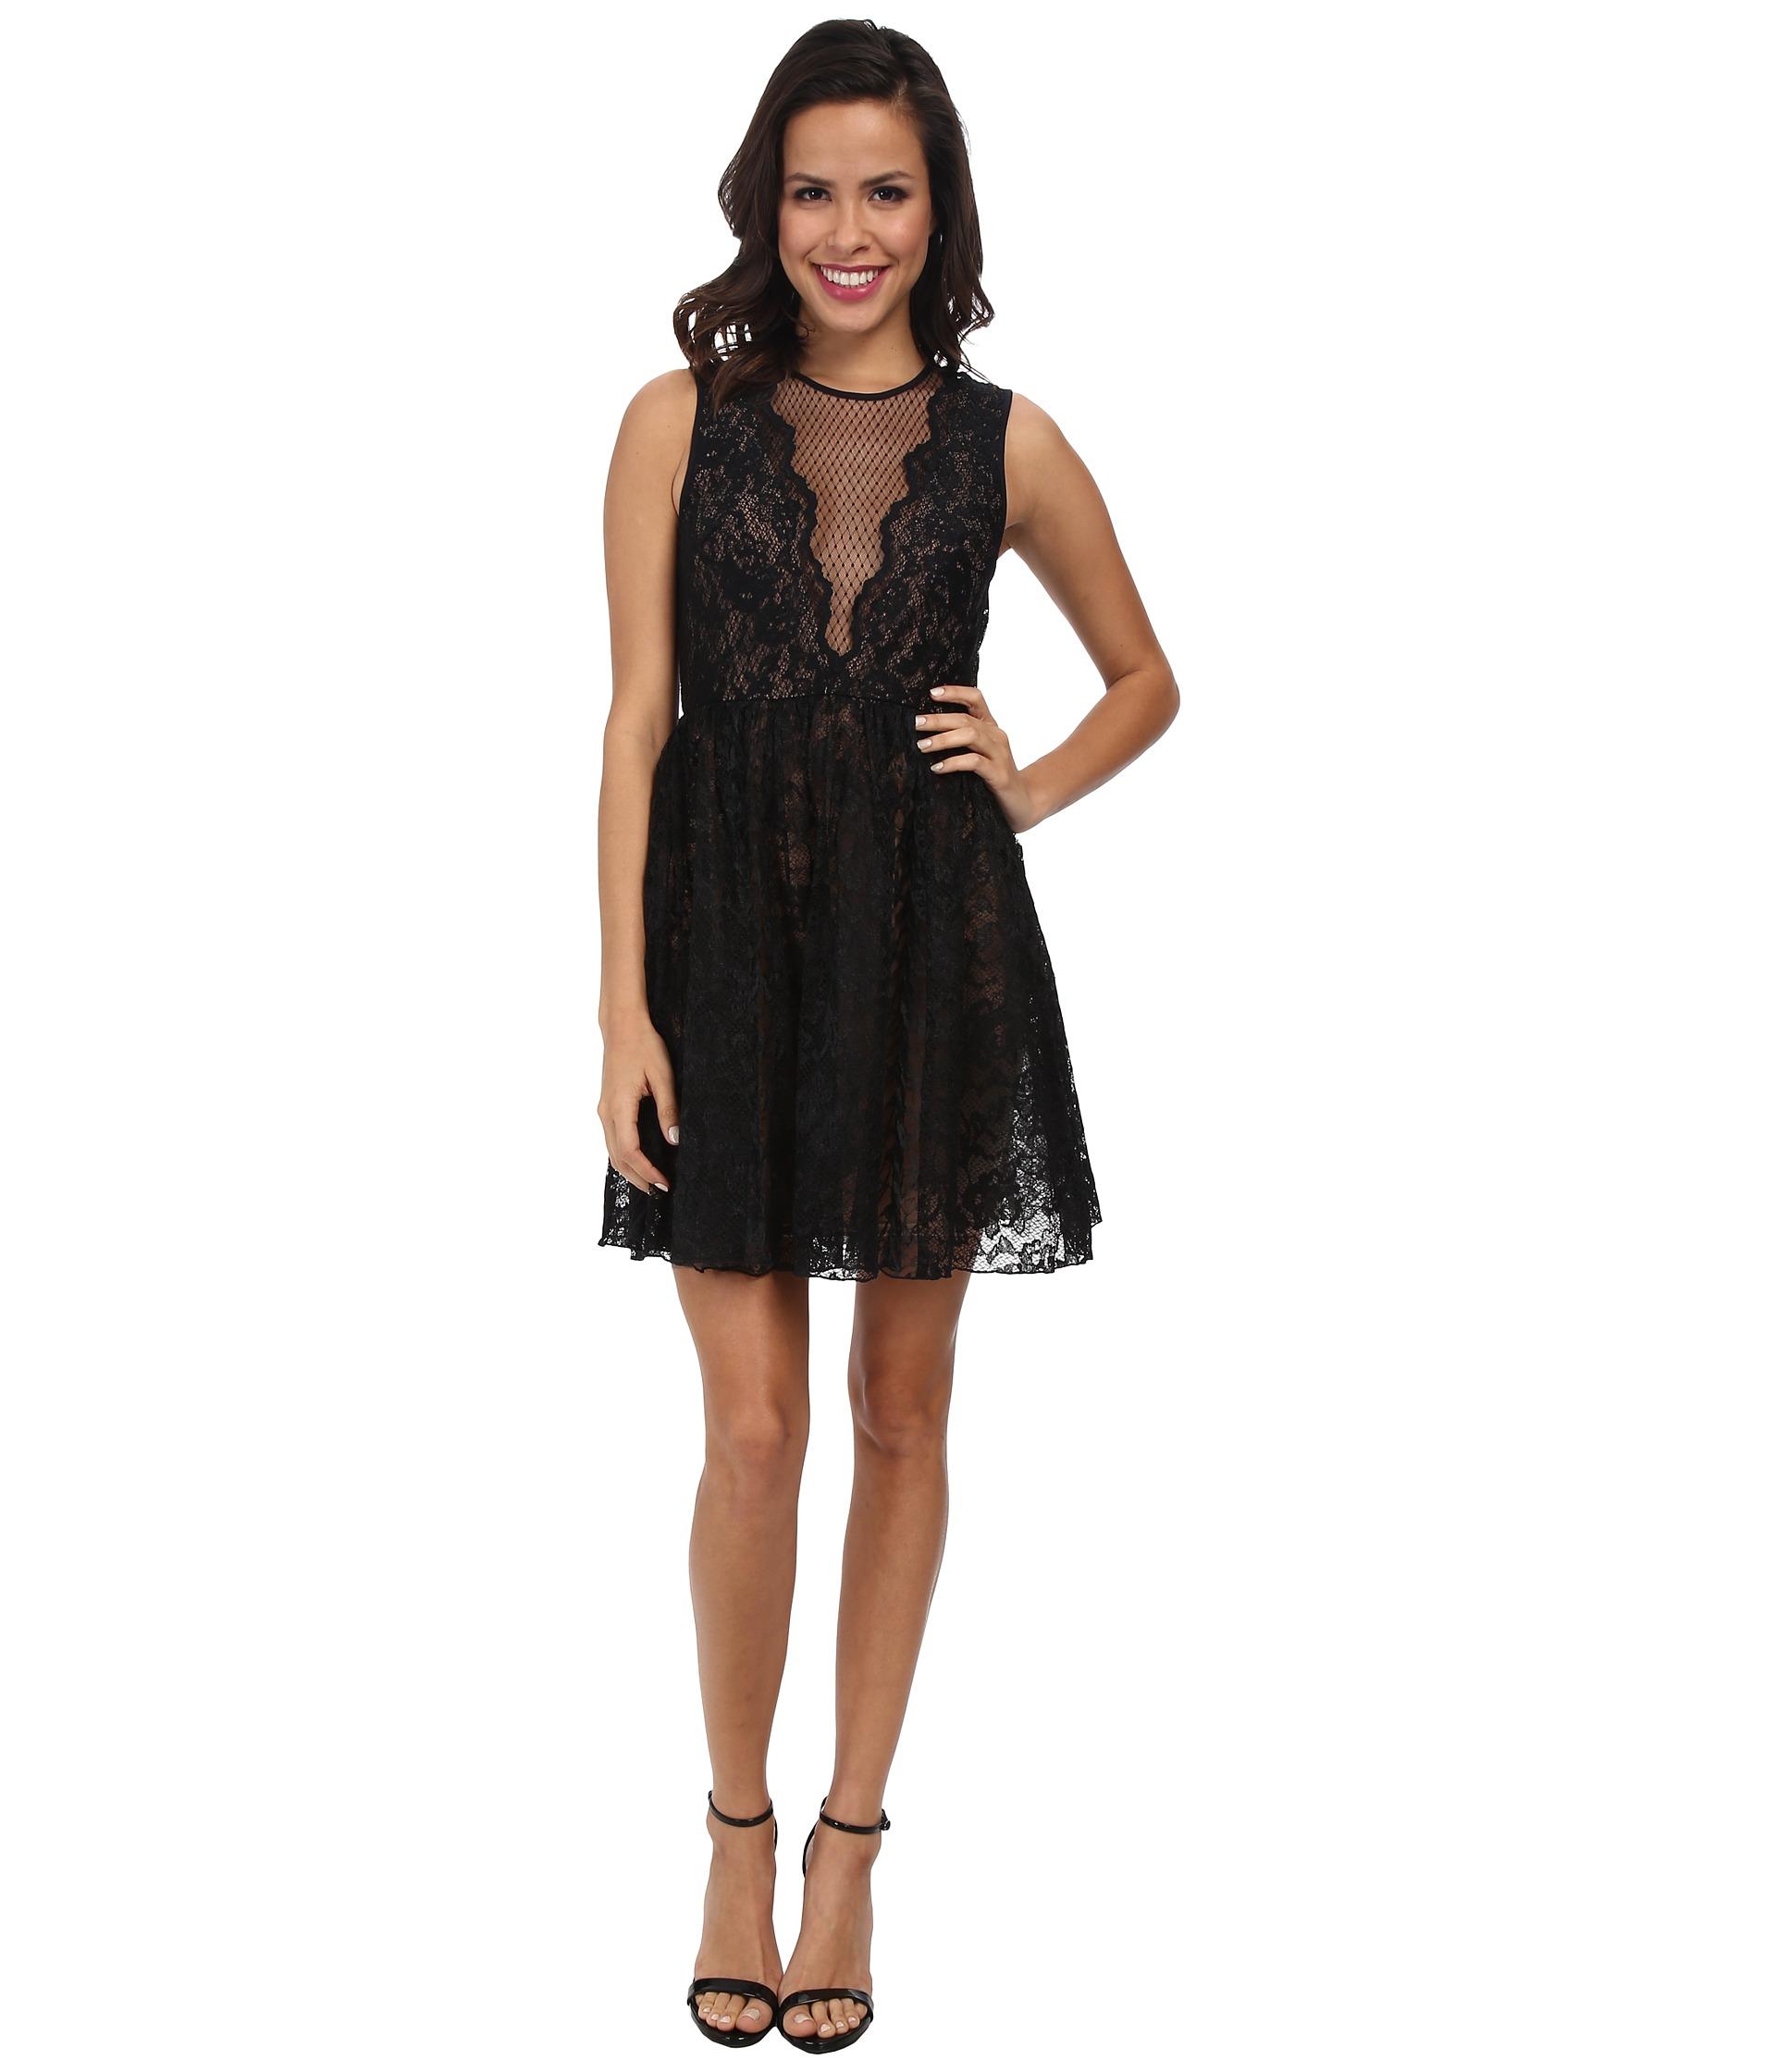 Formal Dress Boutiques Charlotte Nc Tfnlimocom